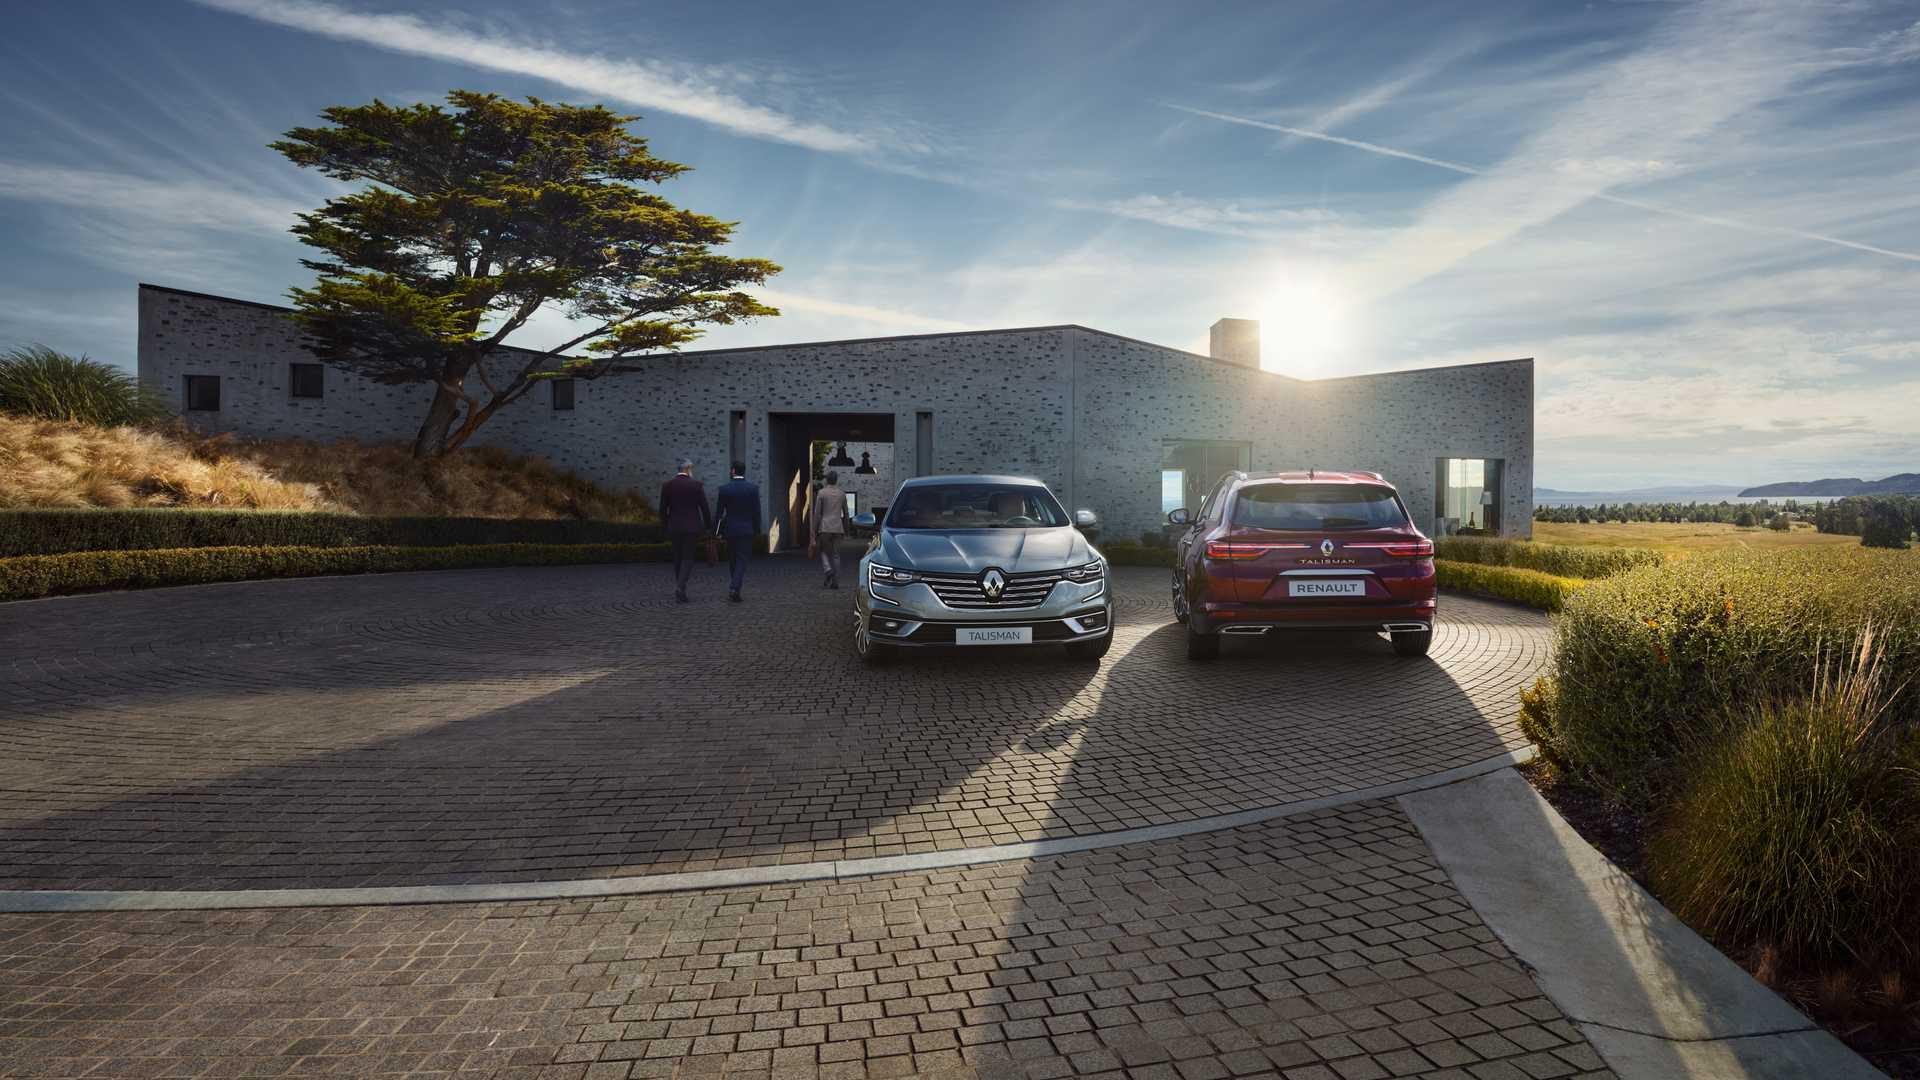 Citroen Ami, Renault Talisman & VW Golf GTI / GTE / GTD